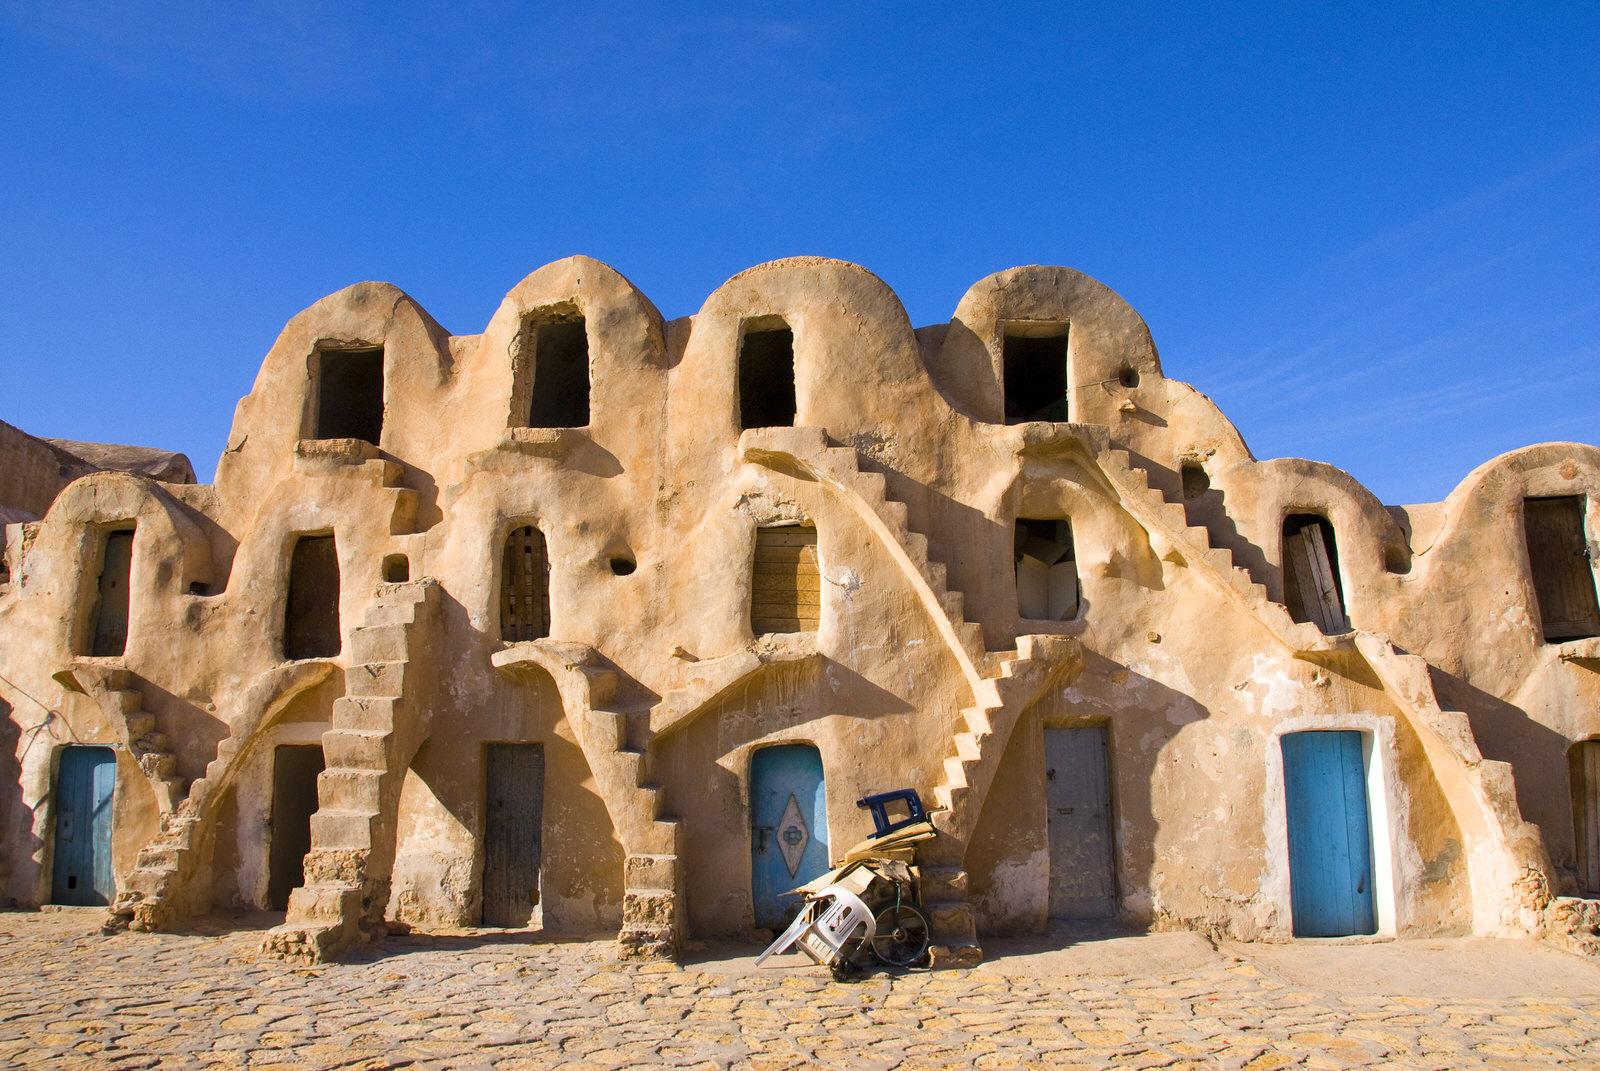 tunisia-medenine-berber-ghorfa-ksar-fc1771aa4d40.jpg